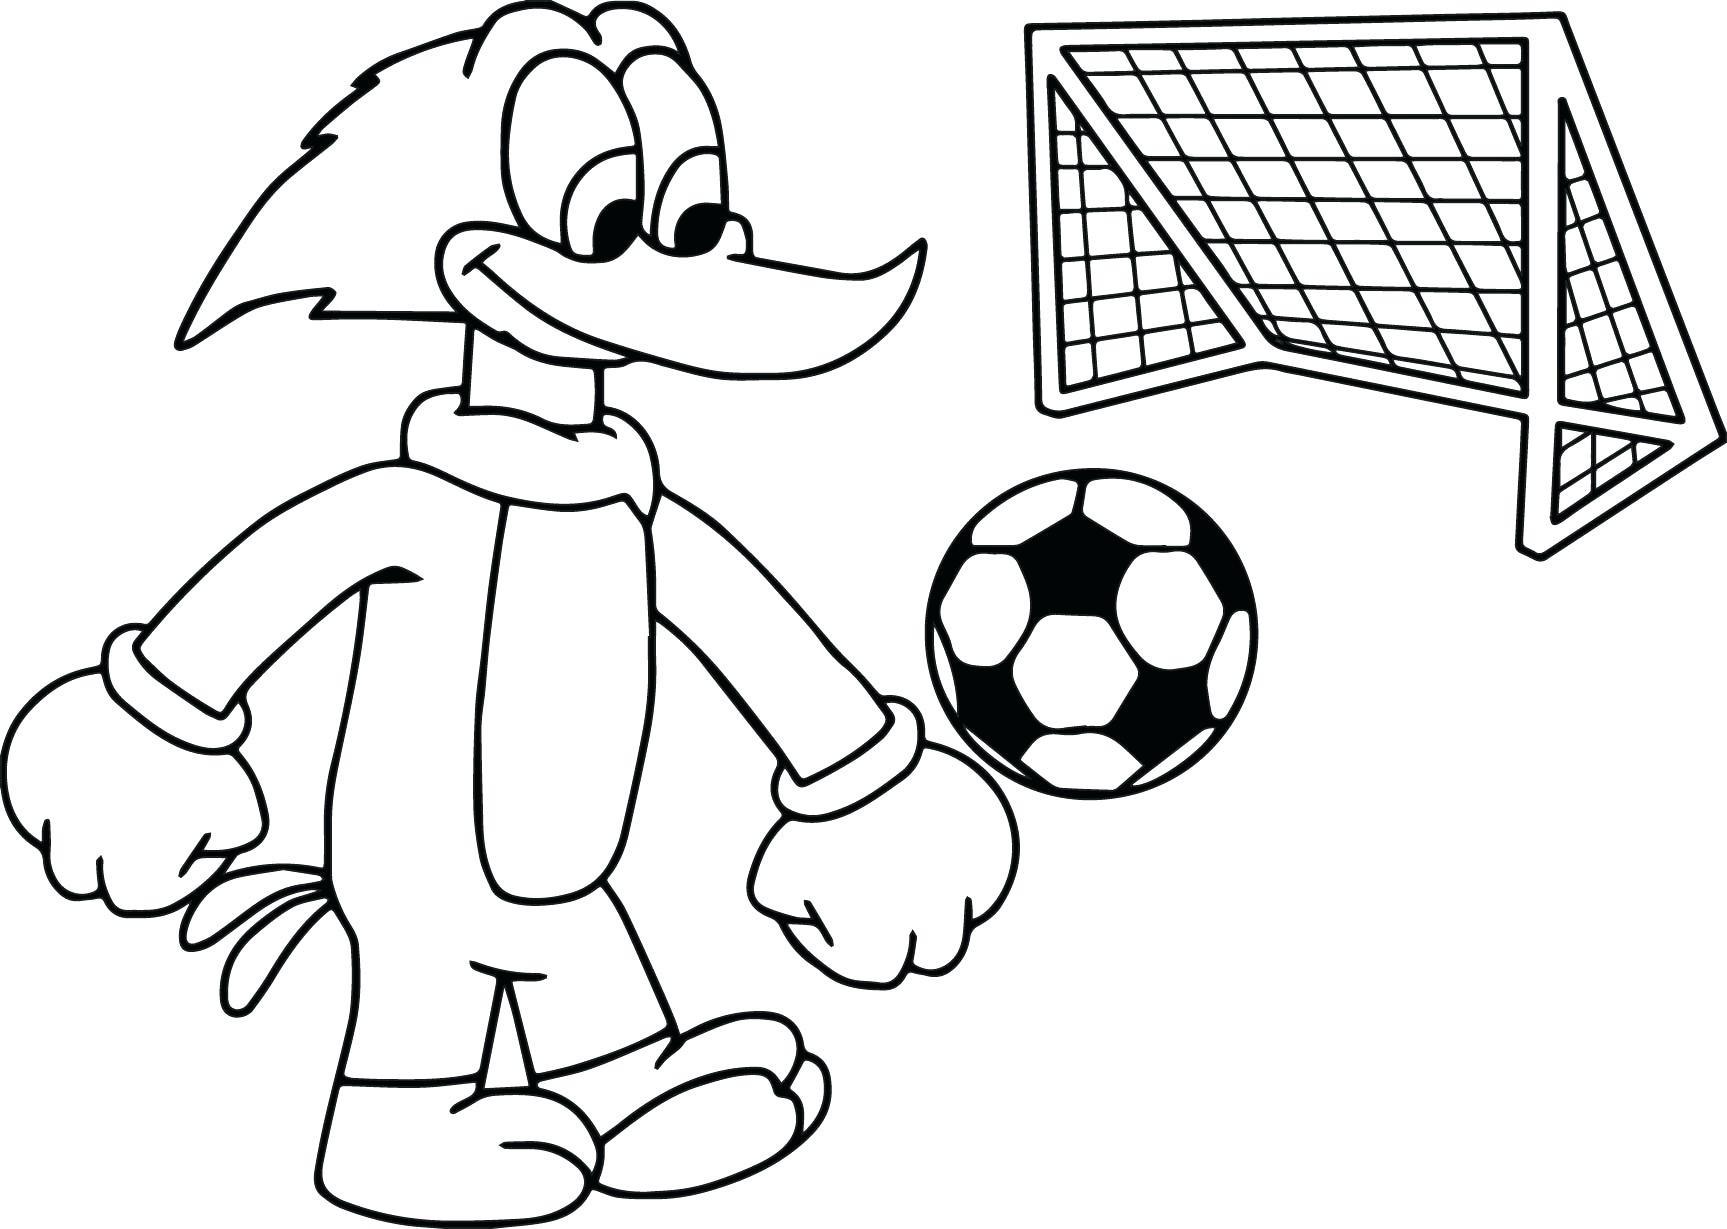 Soccer Drawing At Getdrawings